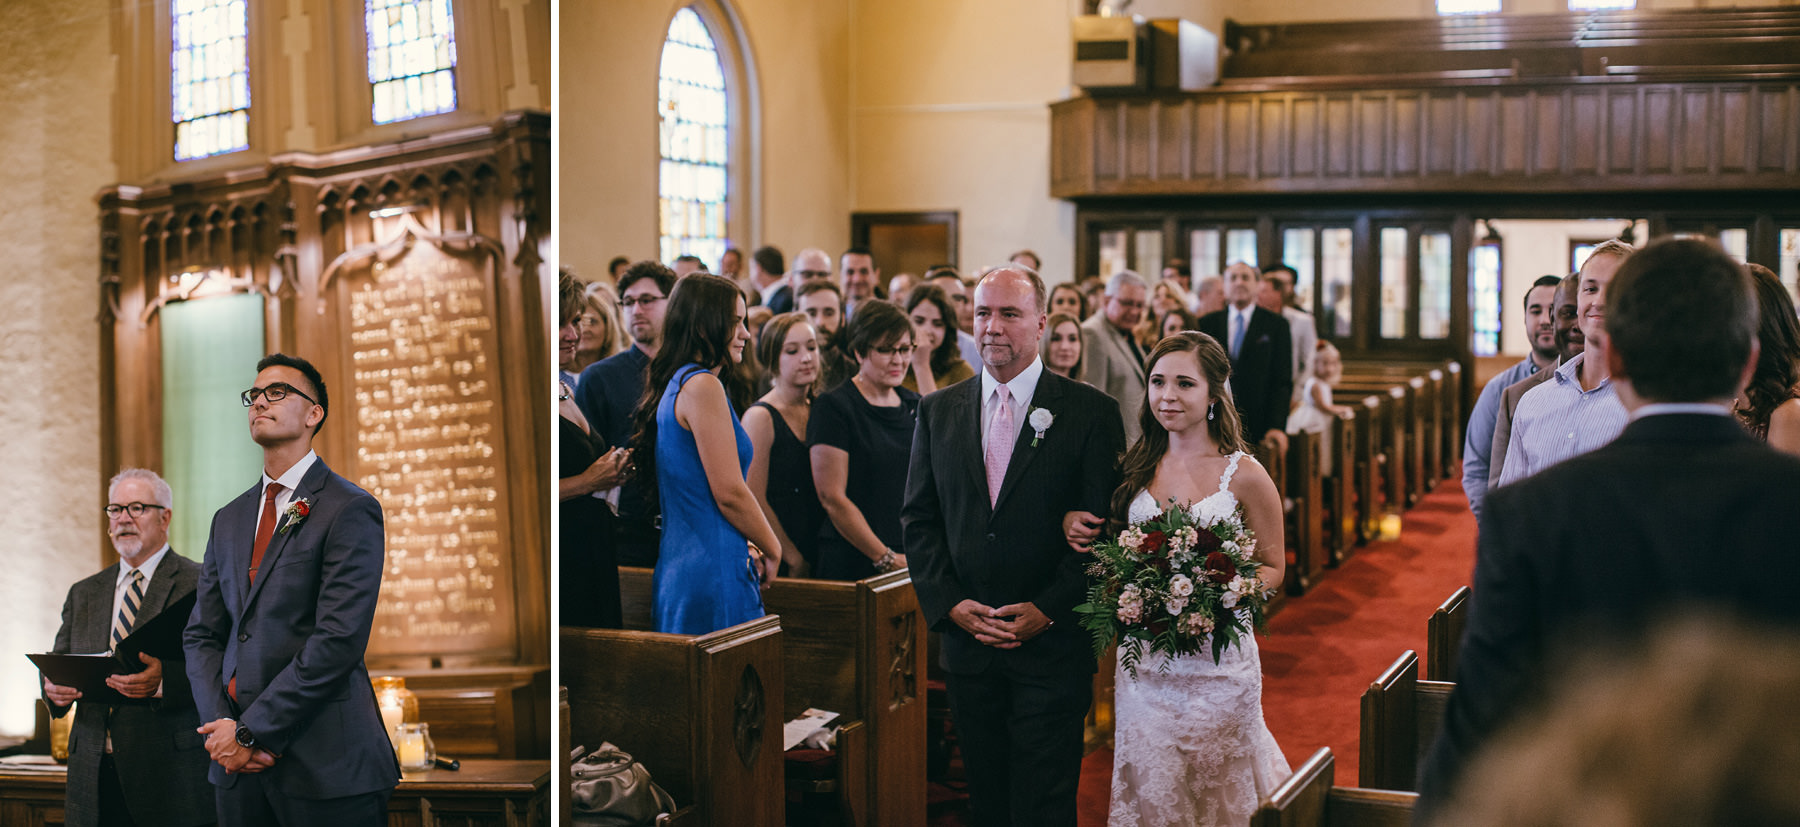 Kansas City Summer Wedding at the Guild_Kindling Wedding Photography Blog47.JPG